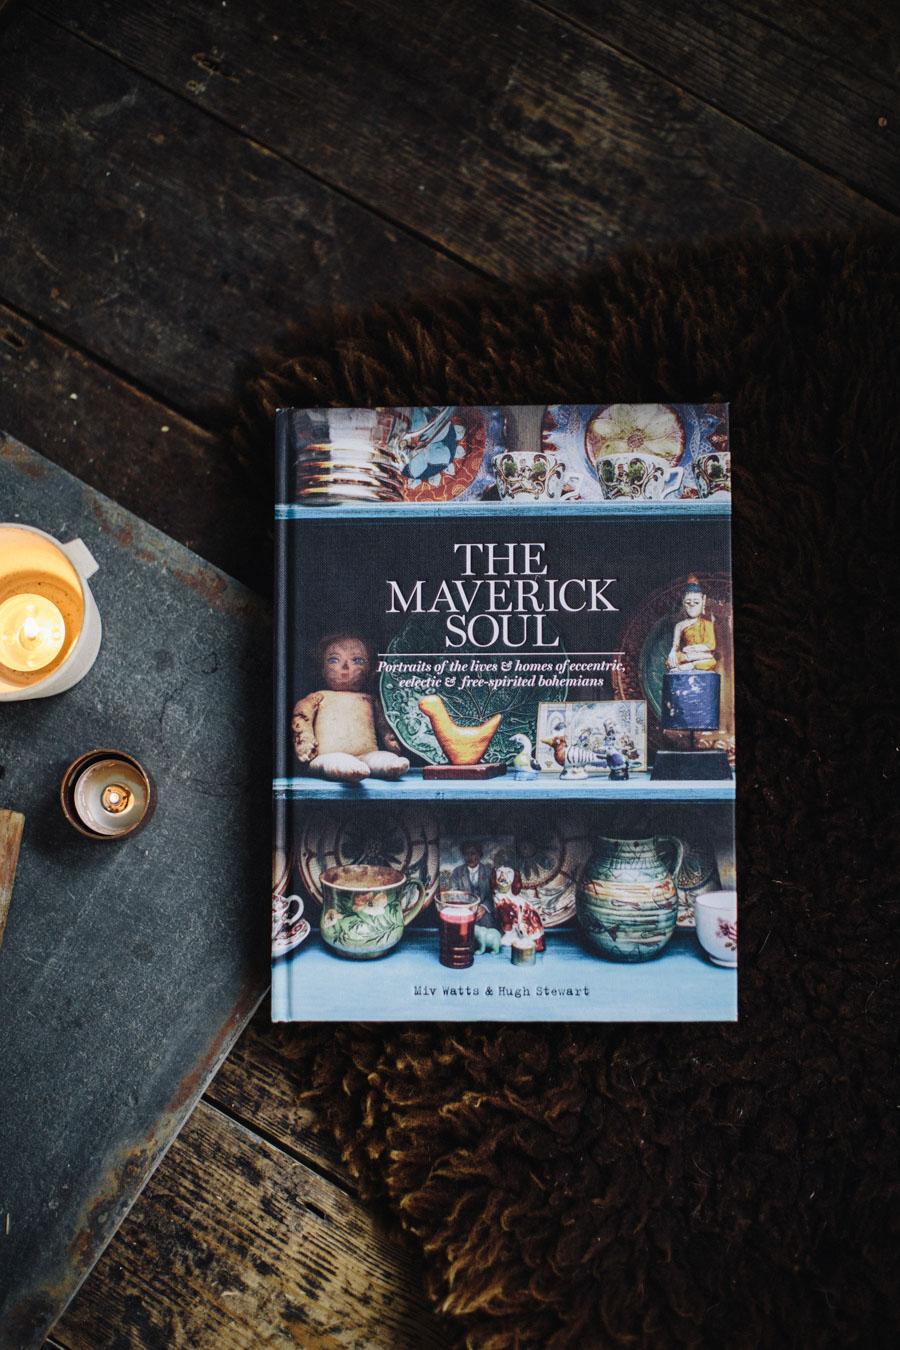 The Maverick Soul by Miv Watts & Hugh Stewart